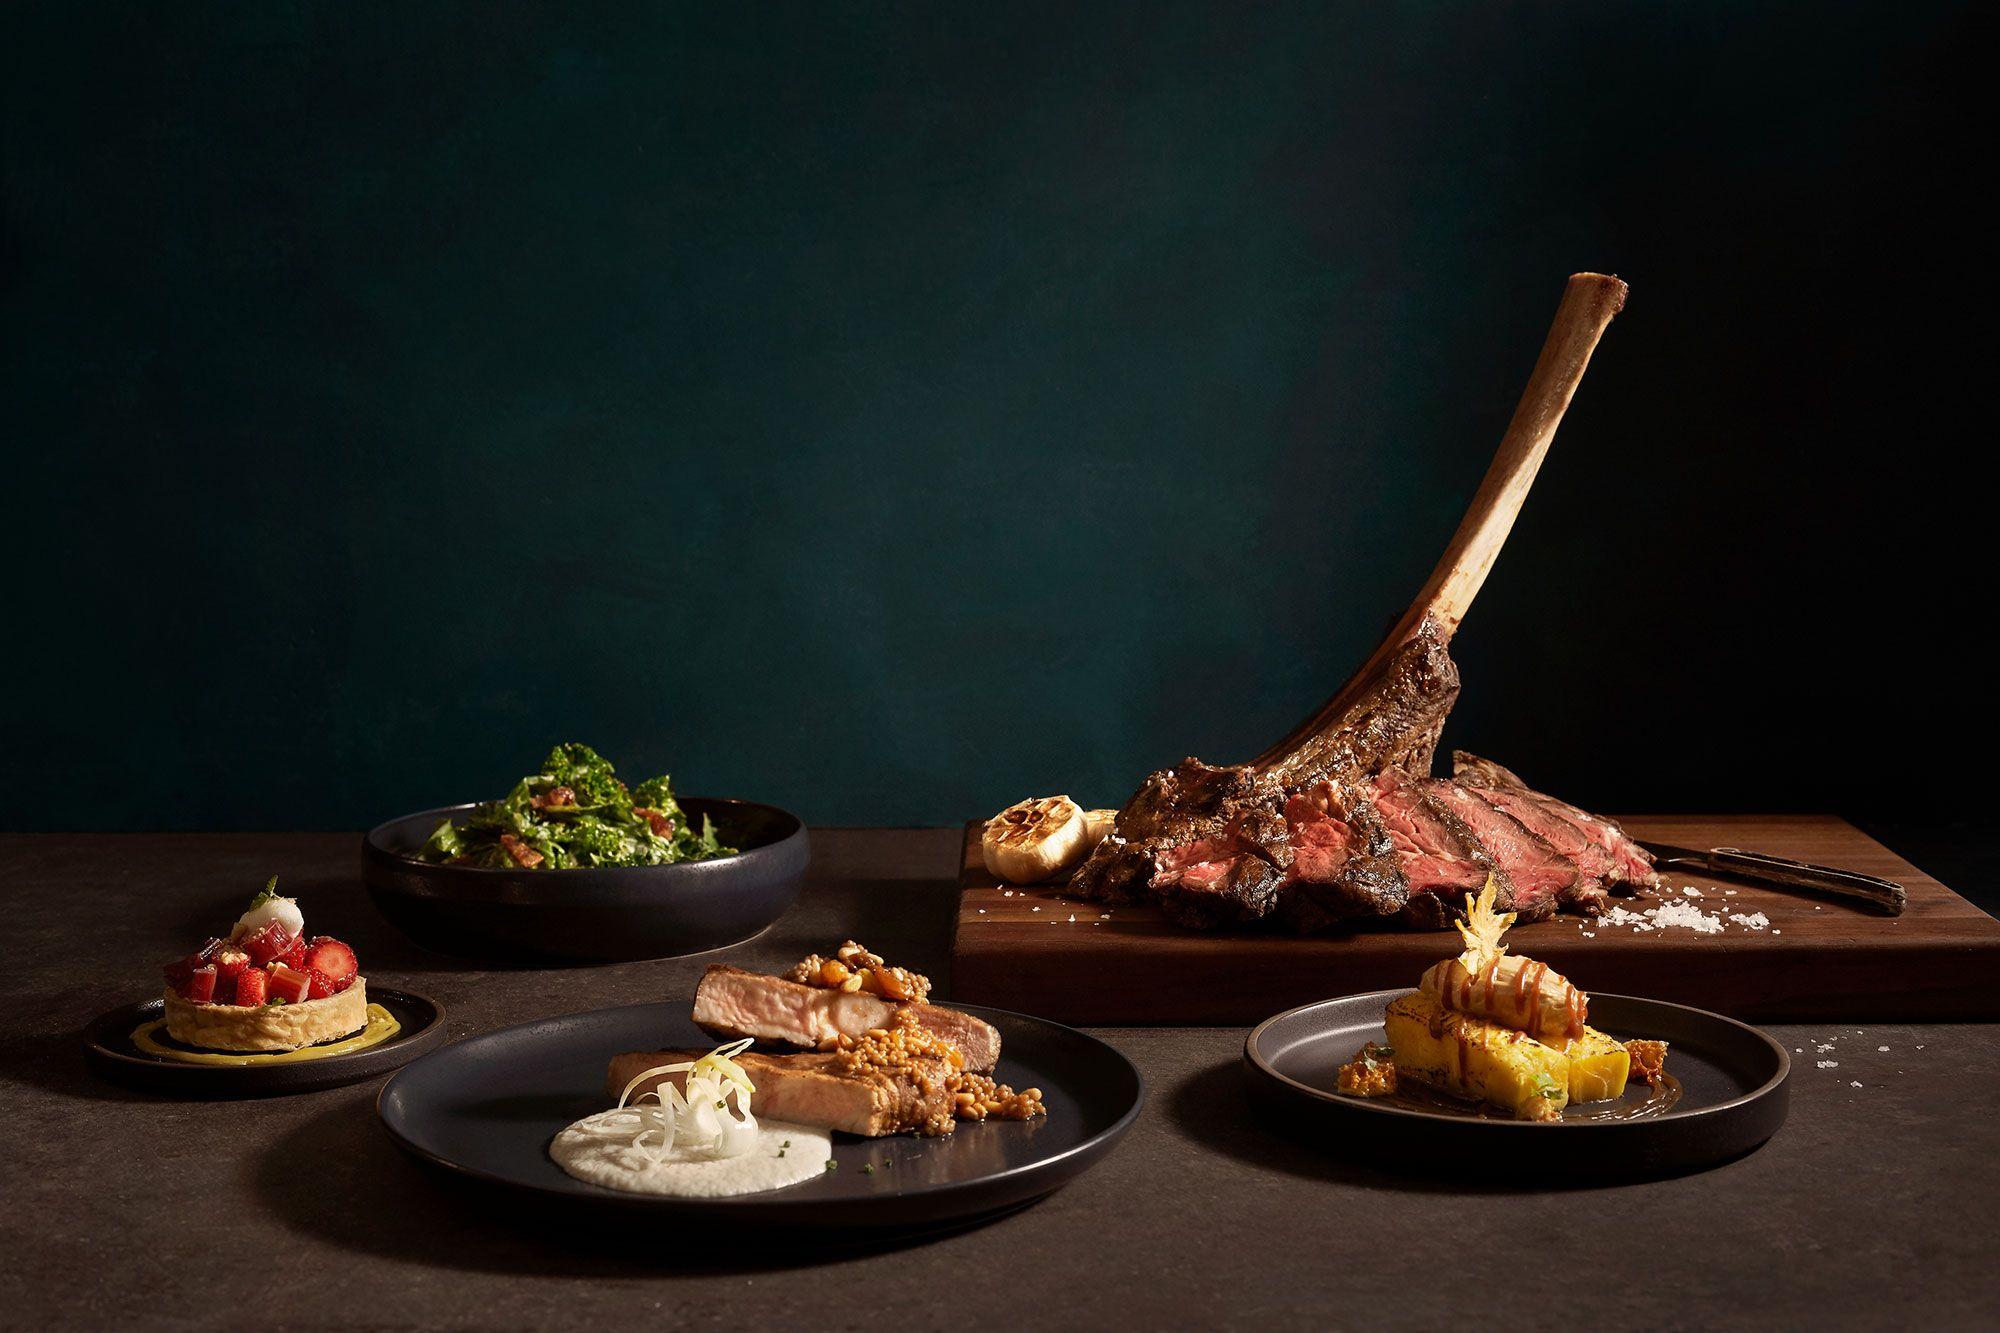 Where To Eat This Week: The Black Swan, Blue Jasmine, Tablescape Restaurant & Bar, Si Chuan Dou Hua, Burnt Ends